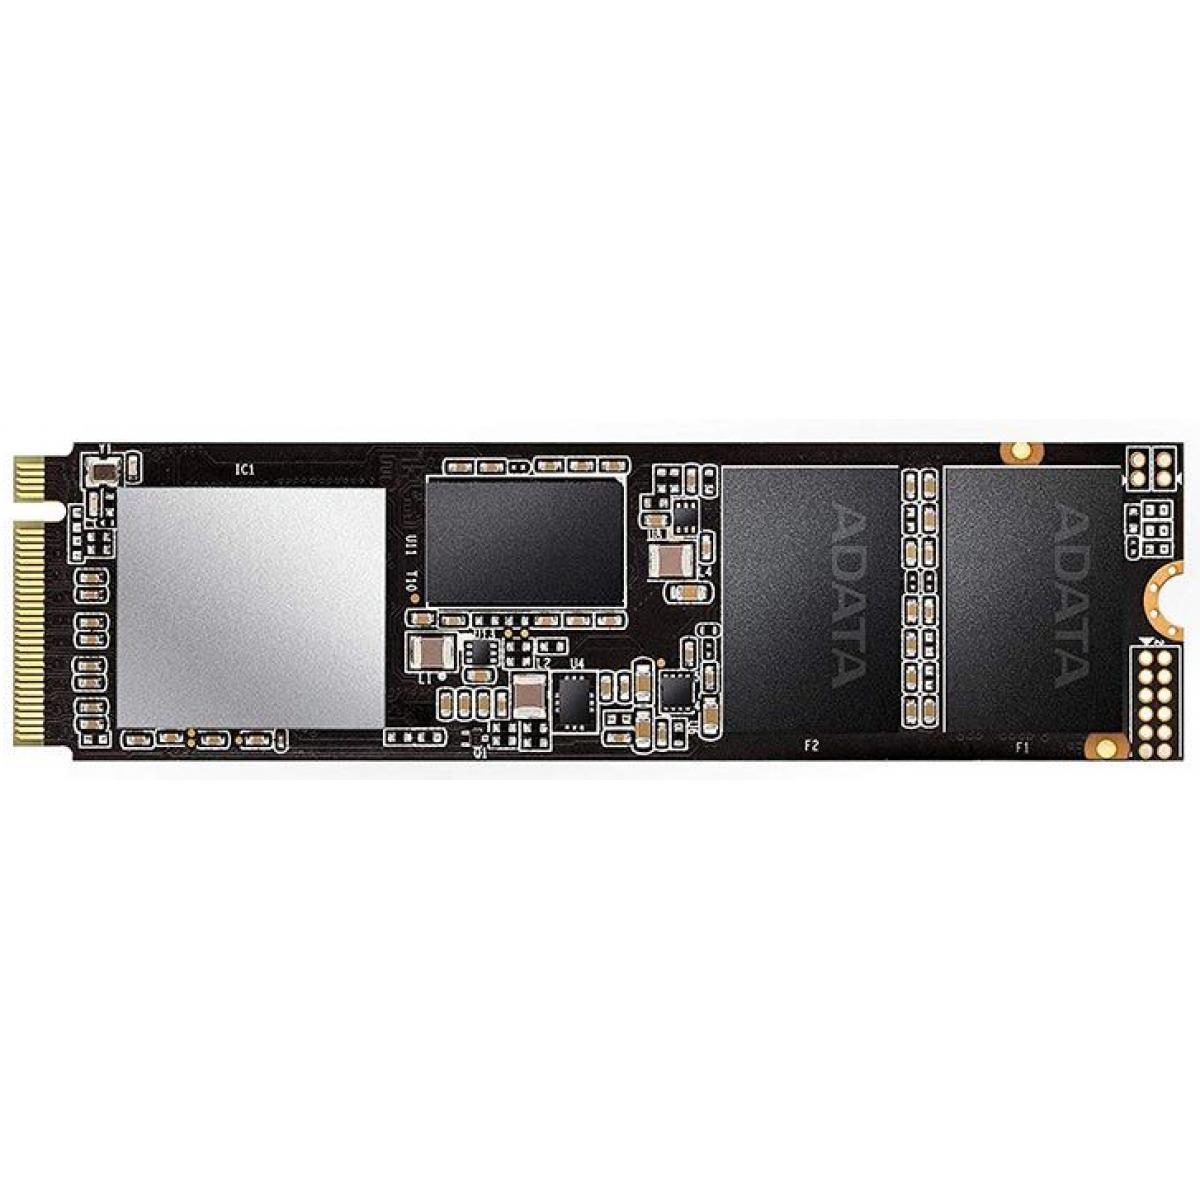 SSD XPG SX8200 Pro, 256GB, M.2 2280, NVMe, Leitura: 3500MBs e Gravação: 3000MBs, ASX8200PNP-256GT-C